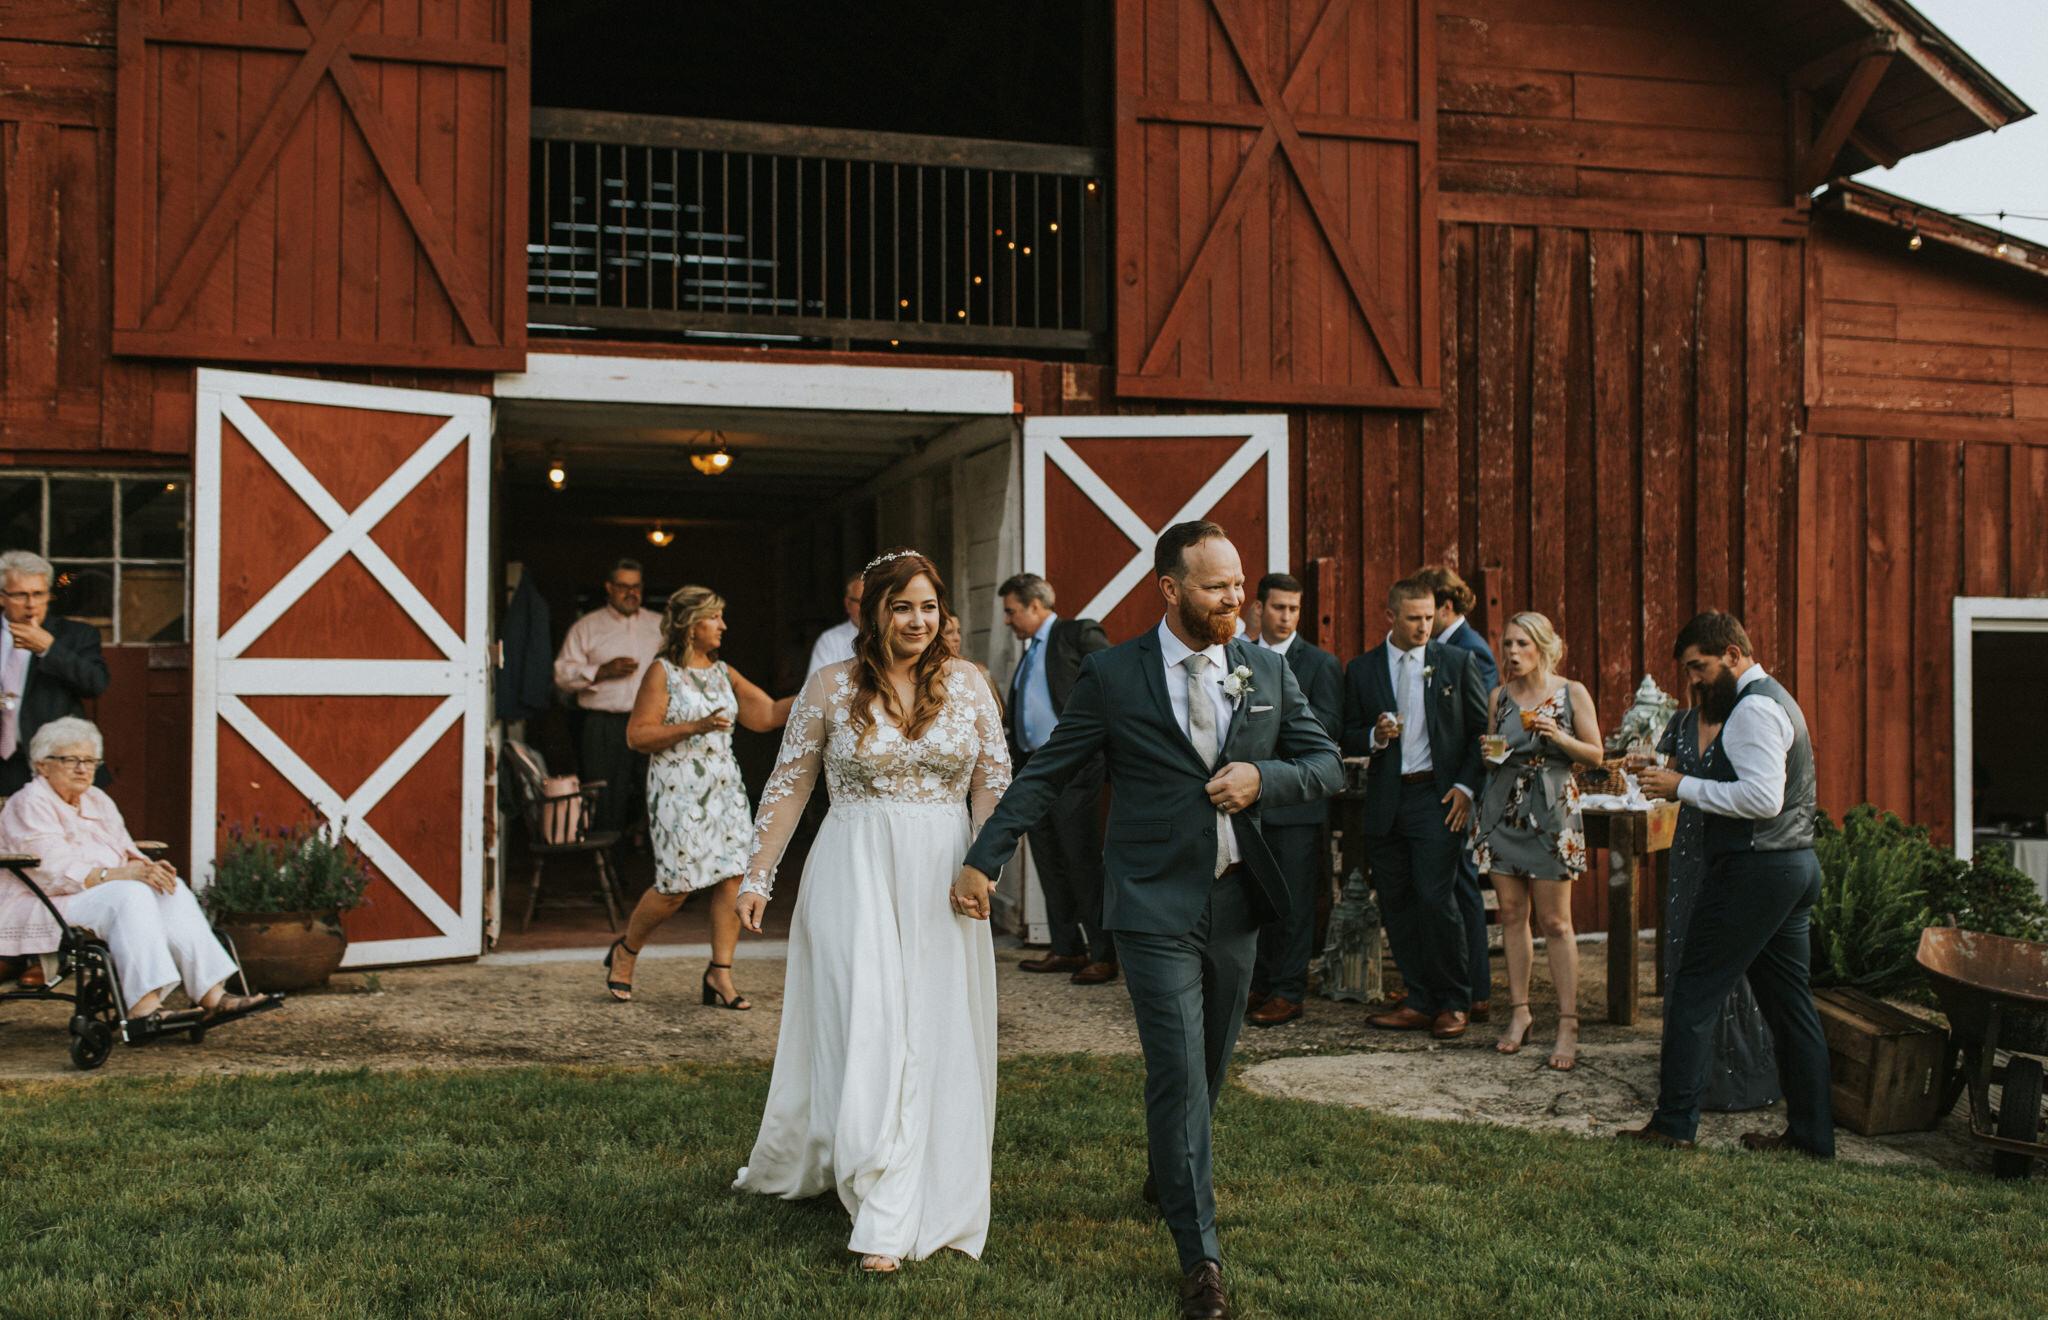 KateMatt-North-Georgia-Wedding-Photographer-Mountain-Laurel-Farm-122.jpg